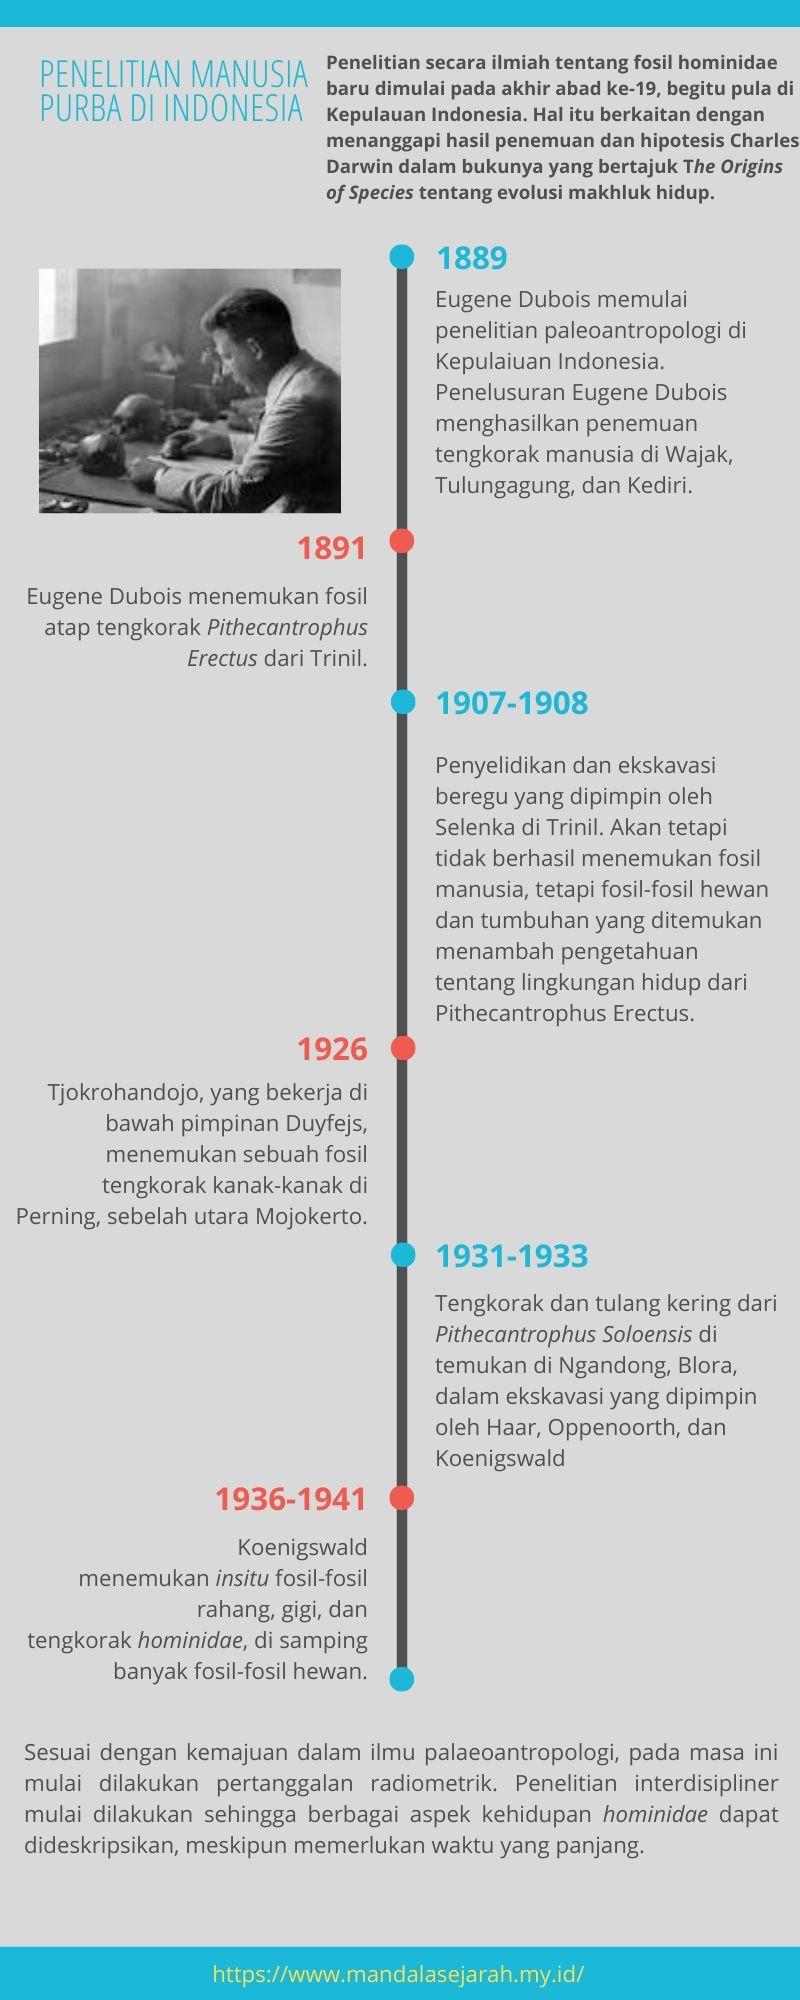 manusia purba di indonesia, manusia purba, penelitian manusia purba, apa itu manusi purba, jenis manusia purba, jenis jenis manusia purba